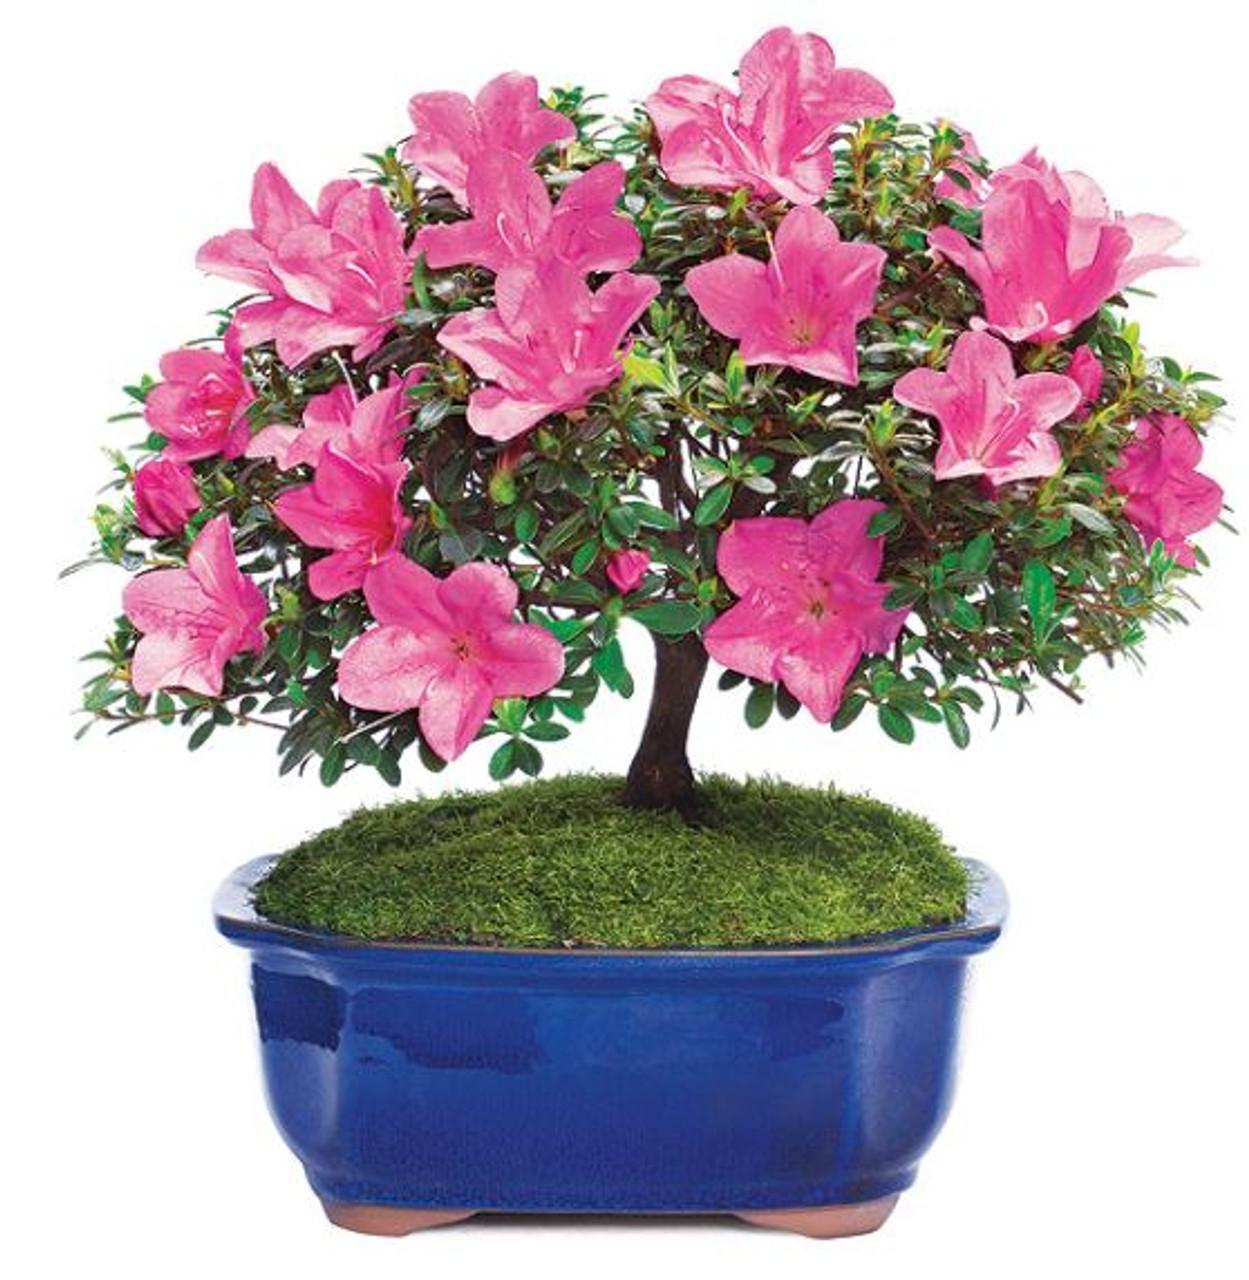 Flowering Satsuki Azalea Bonsai Tree Bonsaioutlet Com